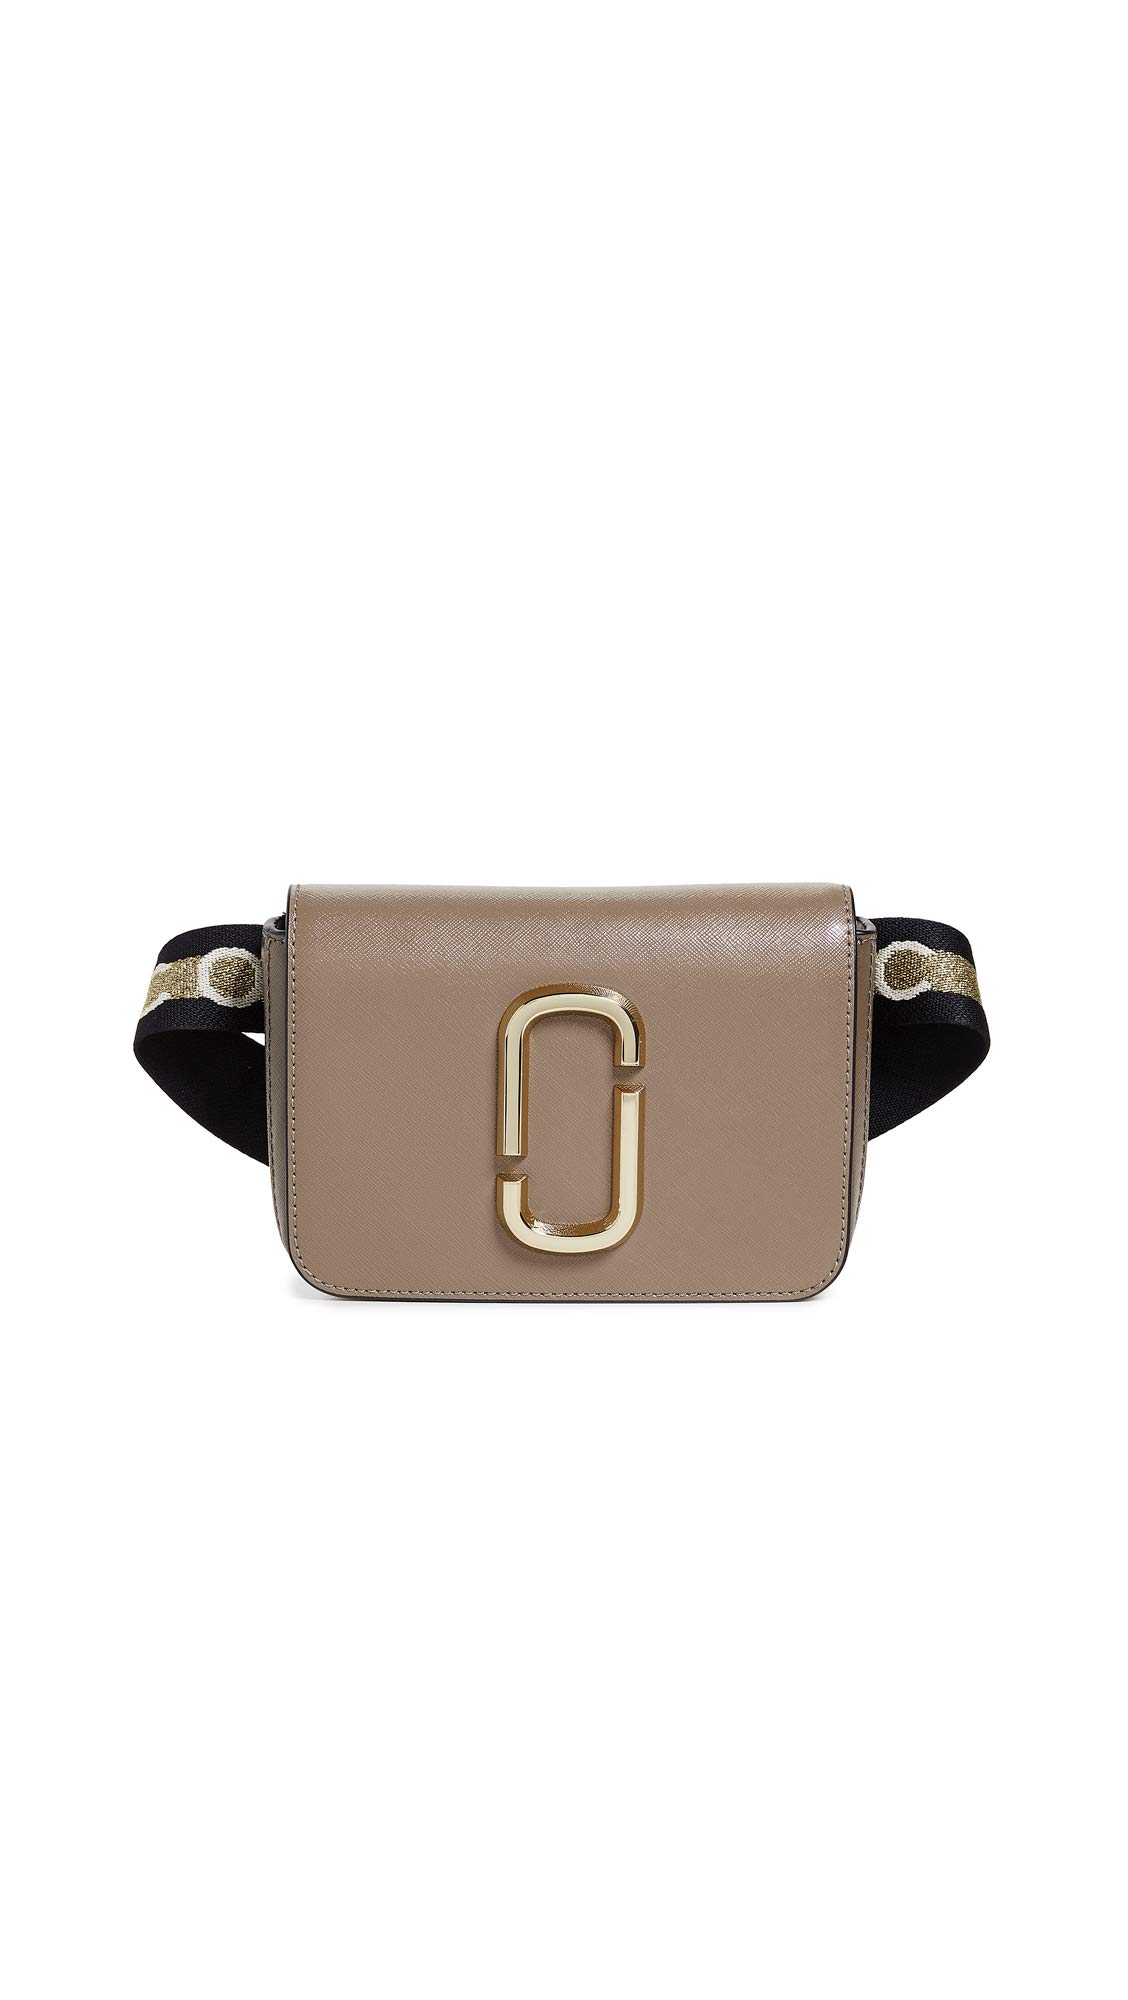 Marc Jacobs Women's M/L Hip Shot Marc Jacobs Convertible Belt Bag, French Grey Multi, One Size